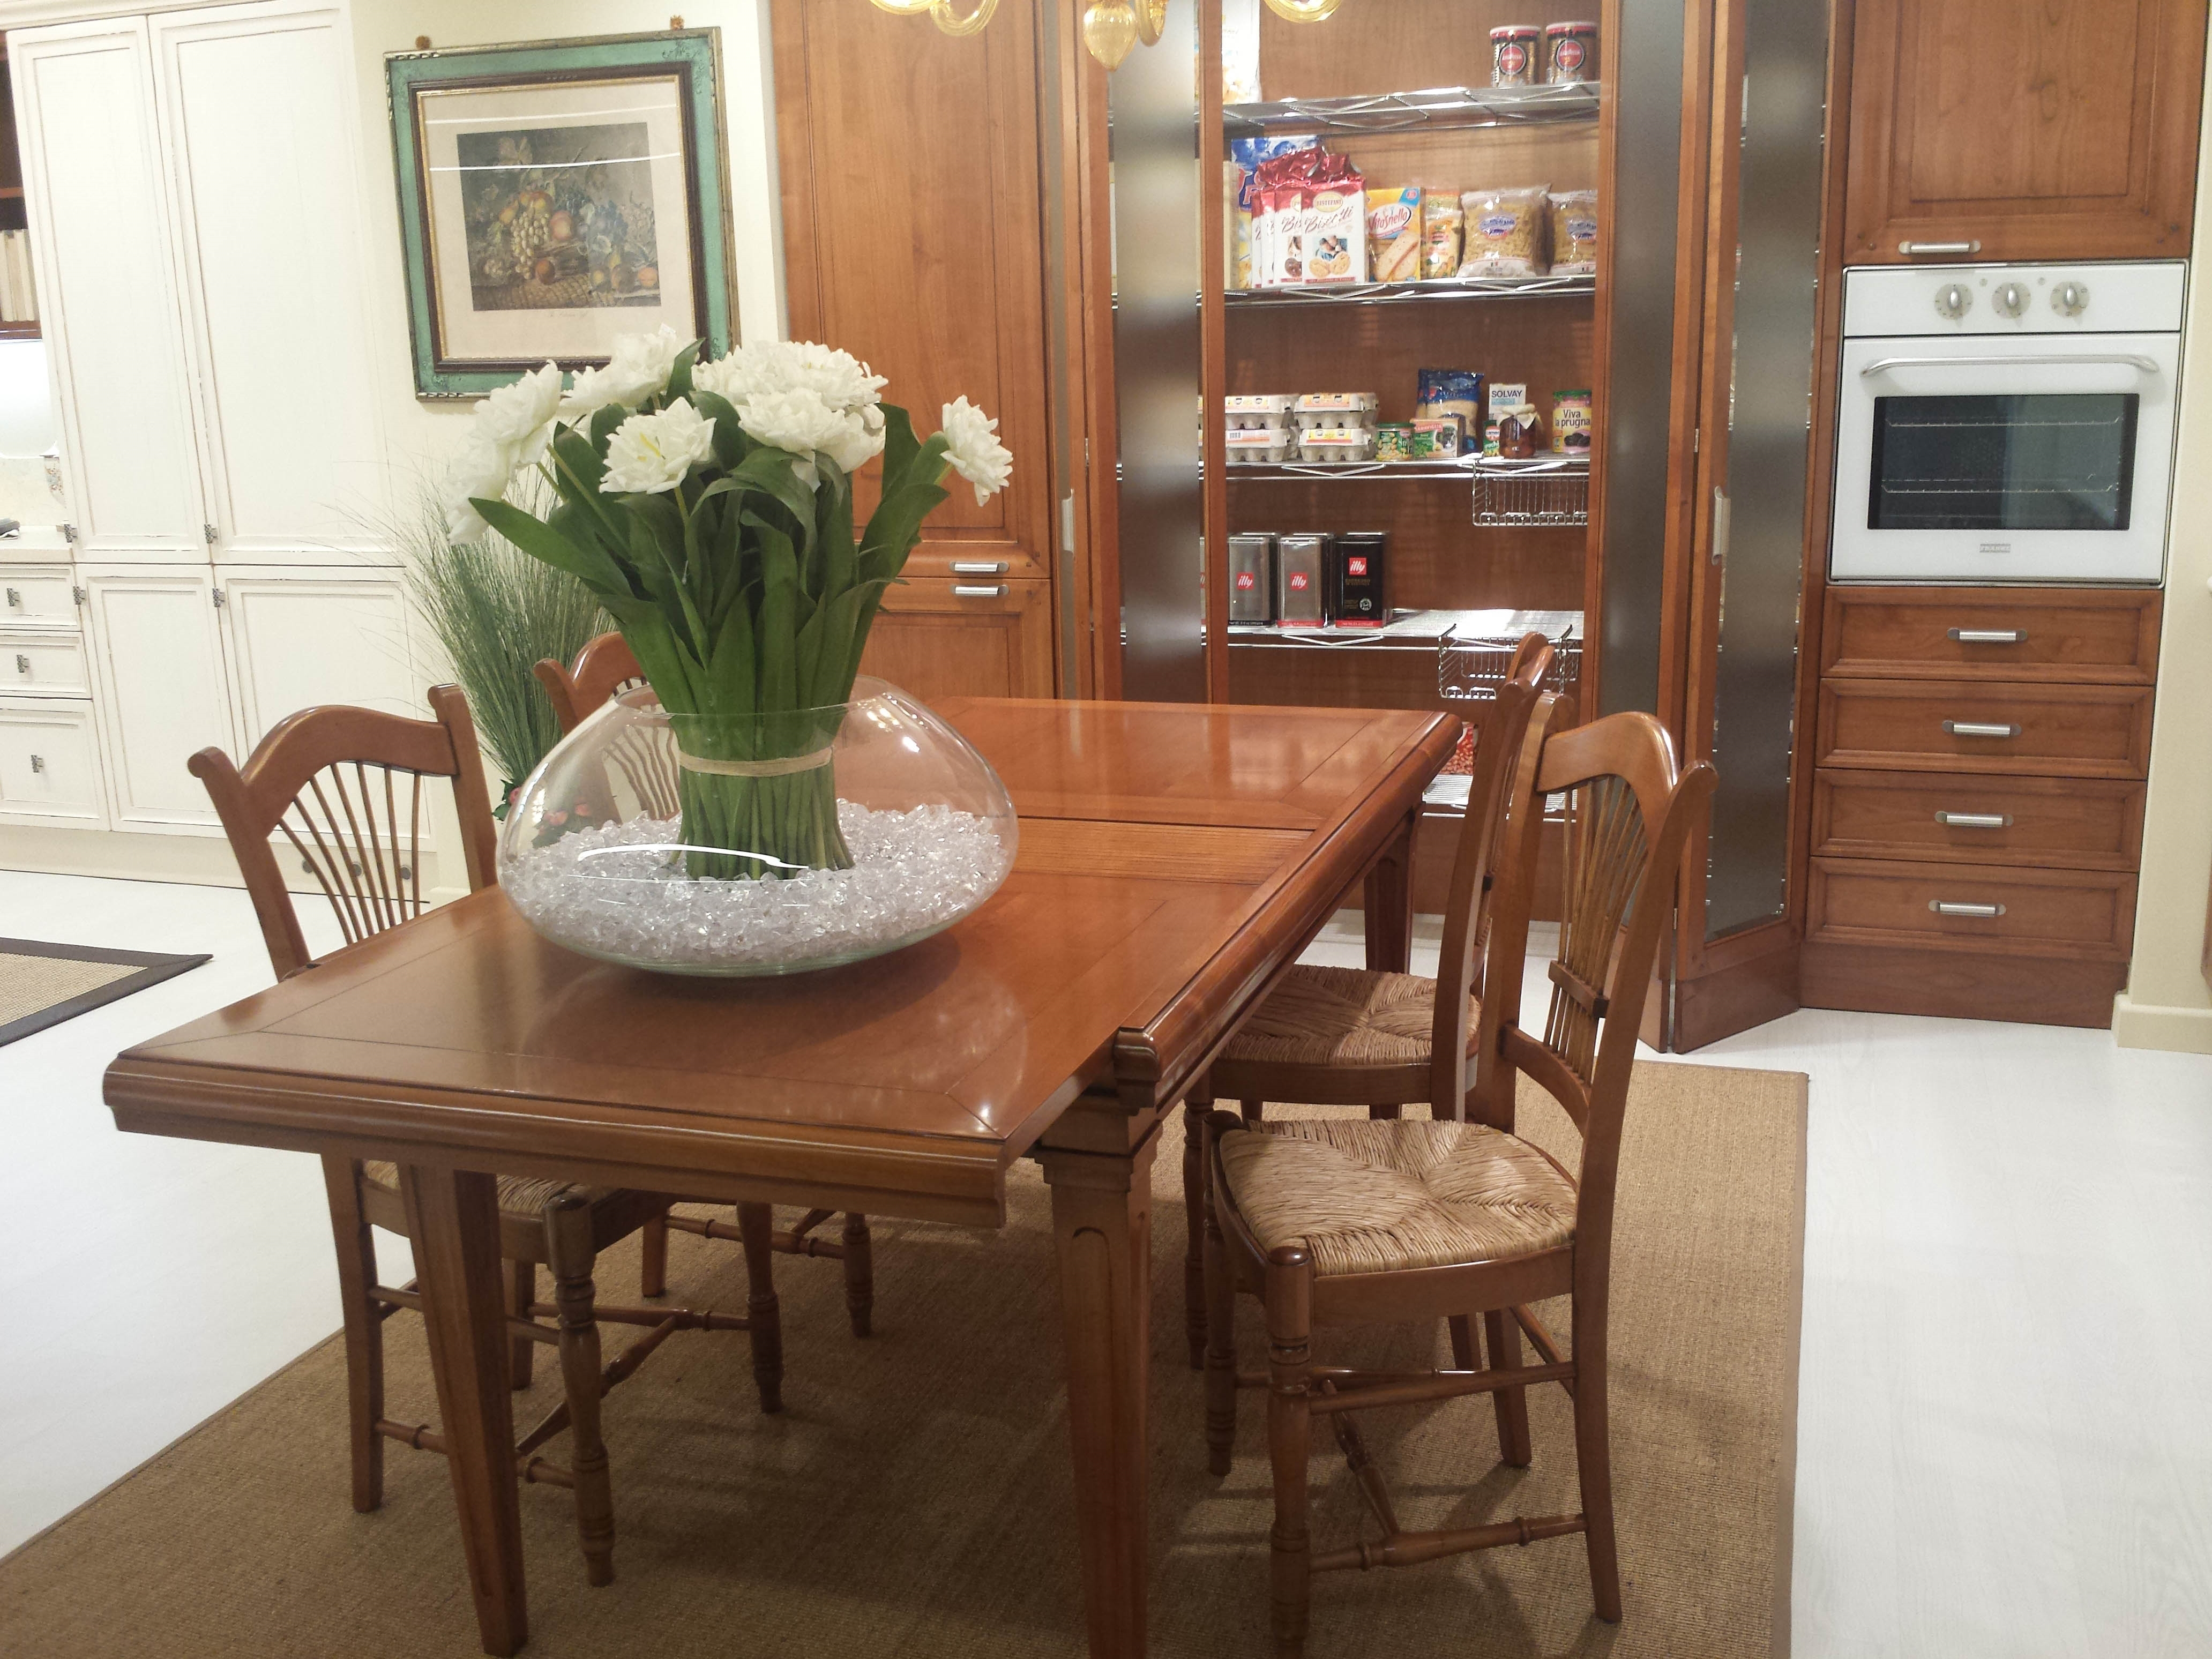 Cucina bamax altamarea classica in ciliegio cucine a prezzi scontati